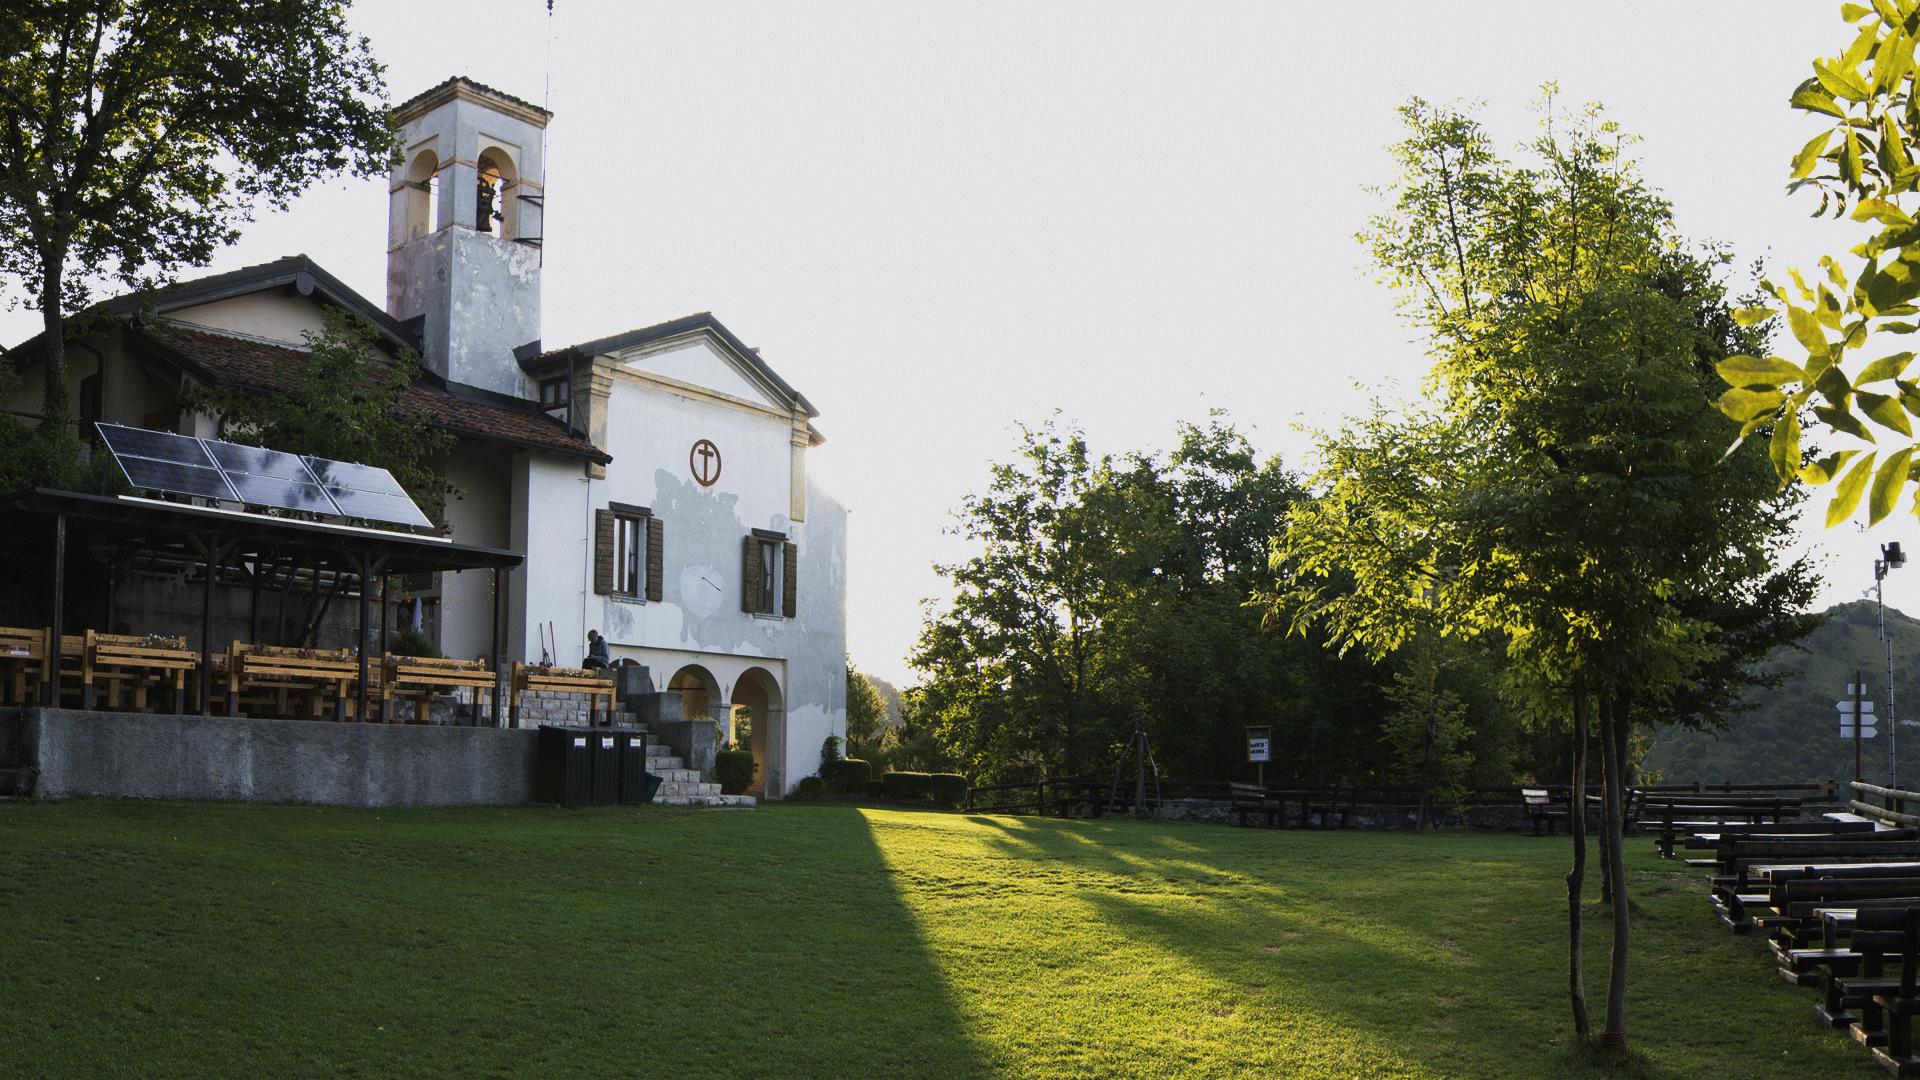 sarezzo-santemiliano-scorcio-santuario